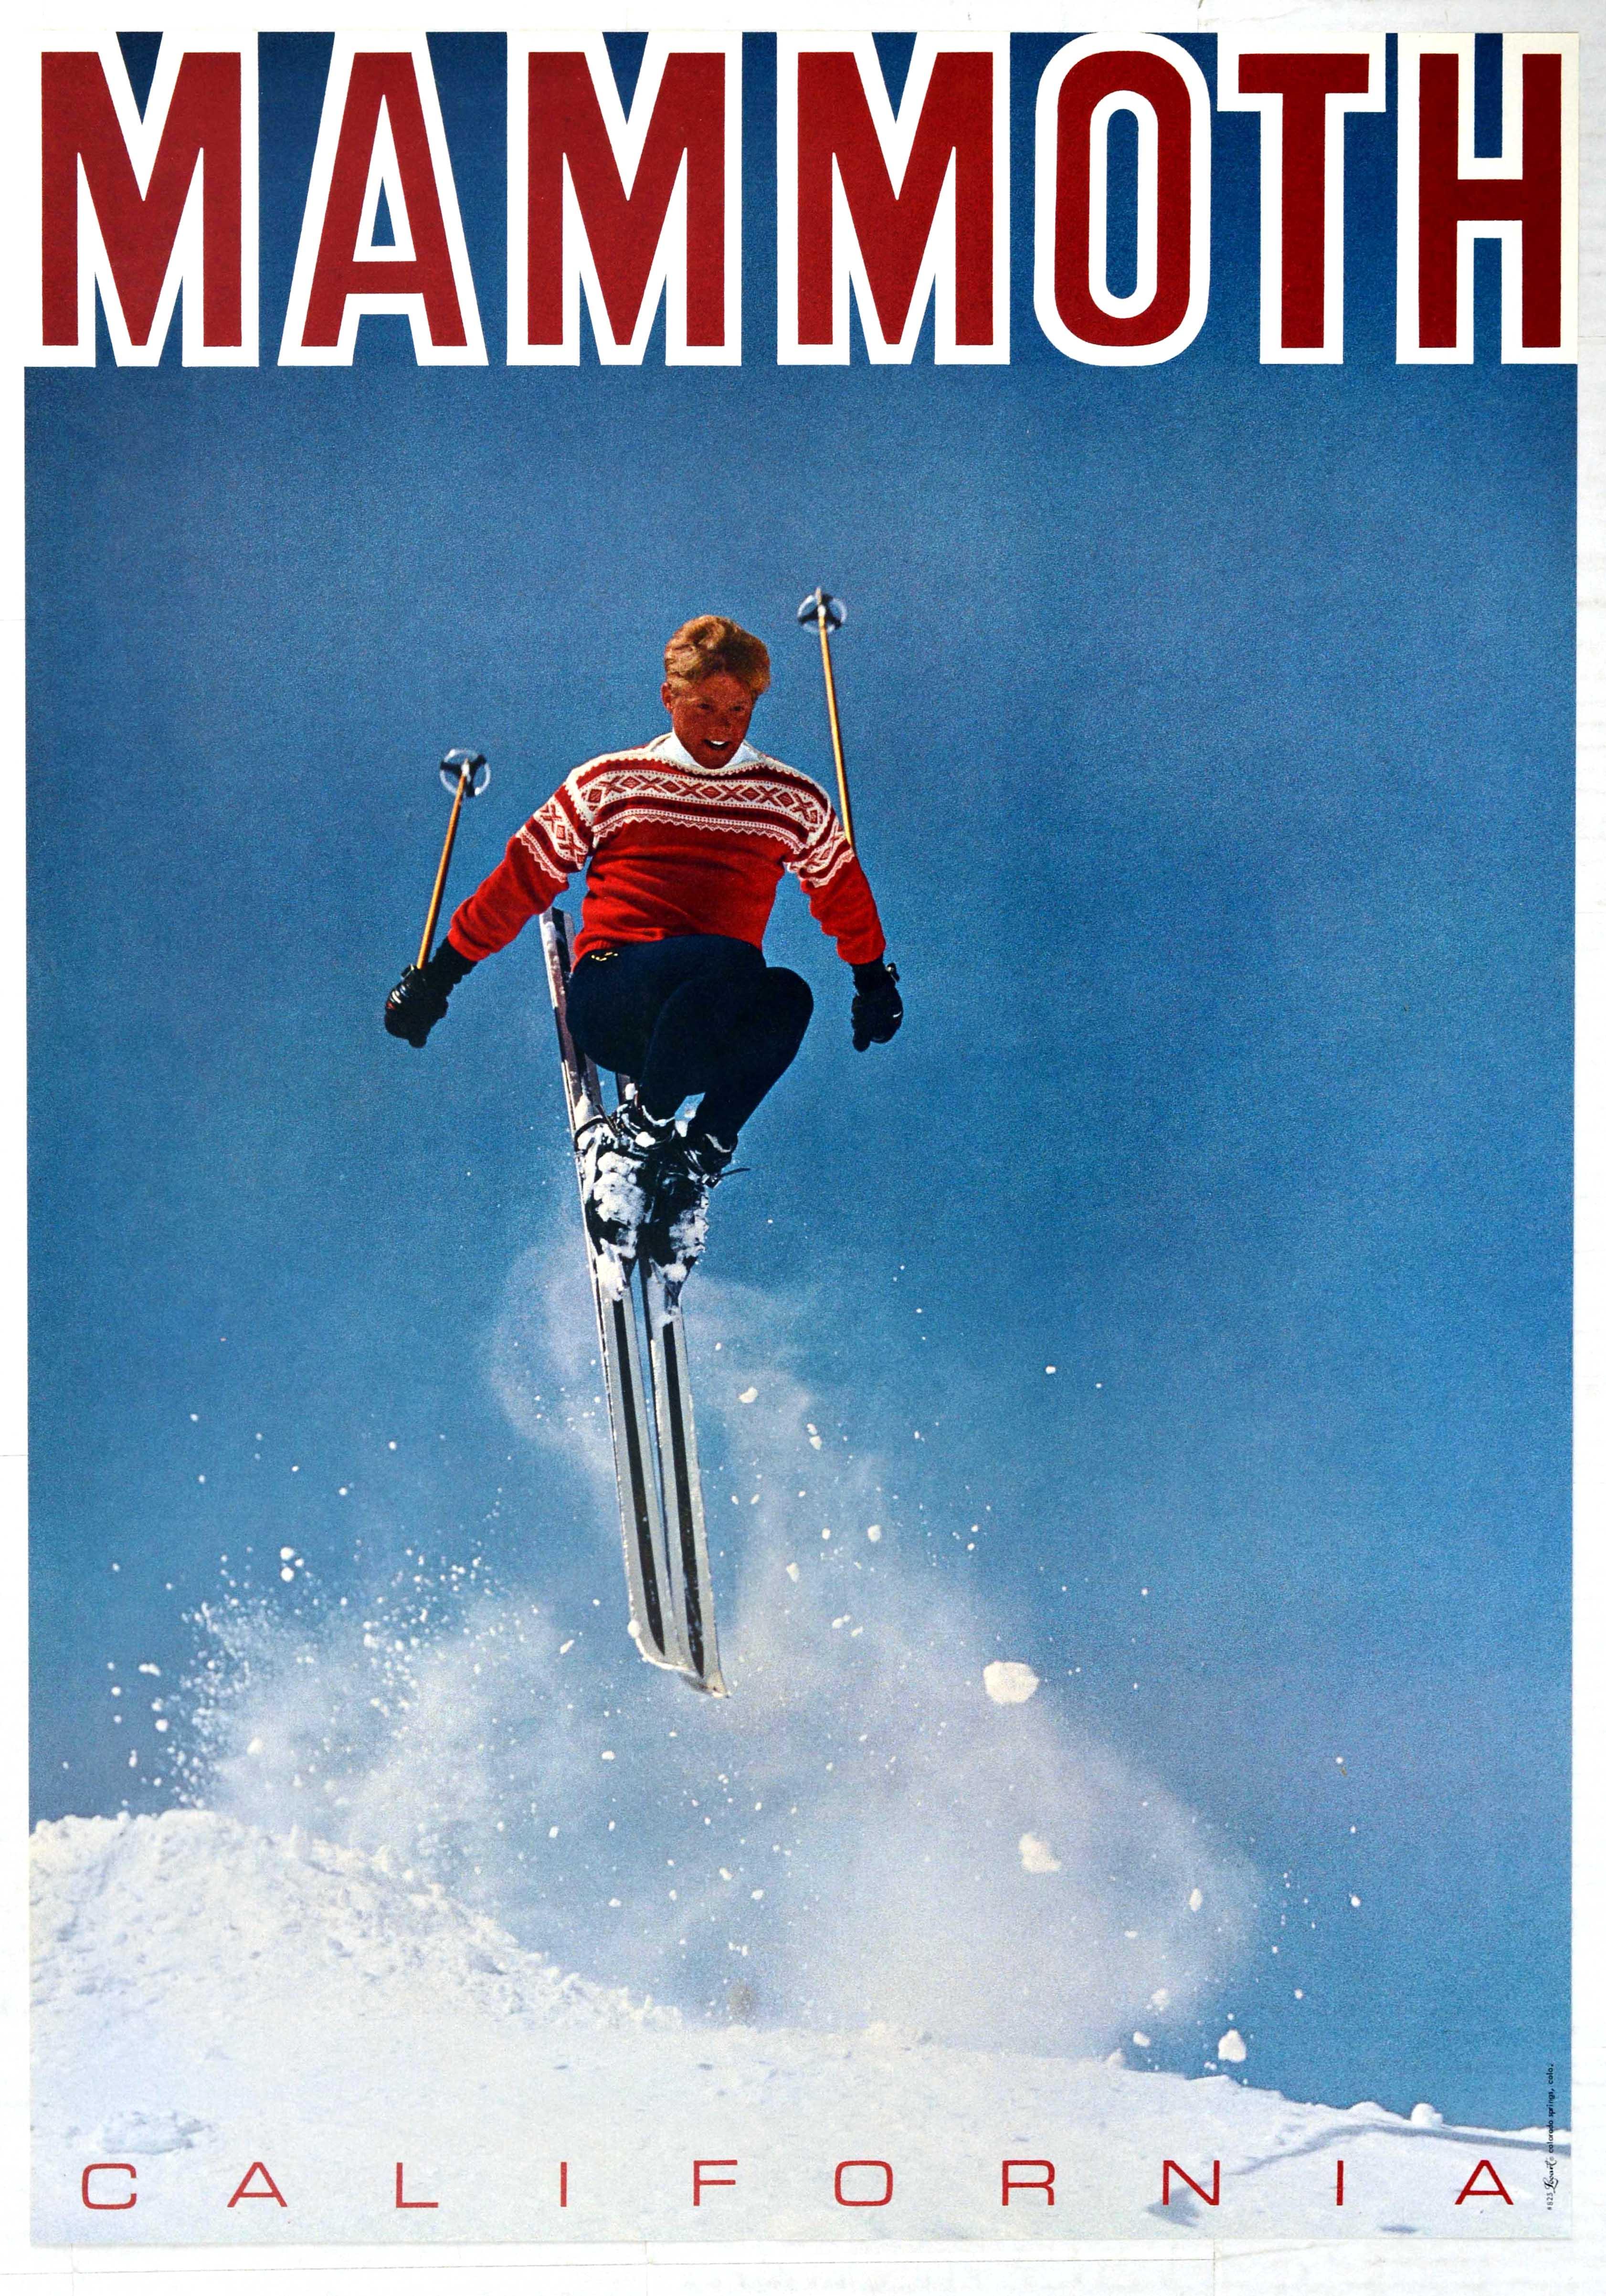 Sport Poster Mammoth Ski California USA